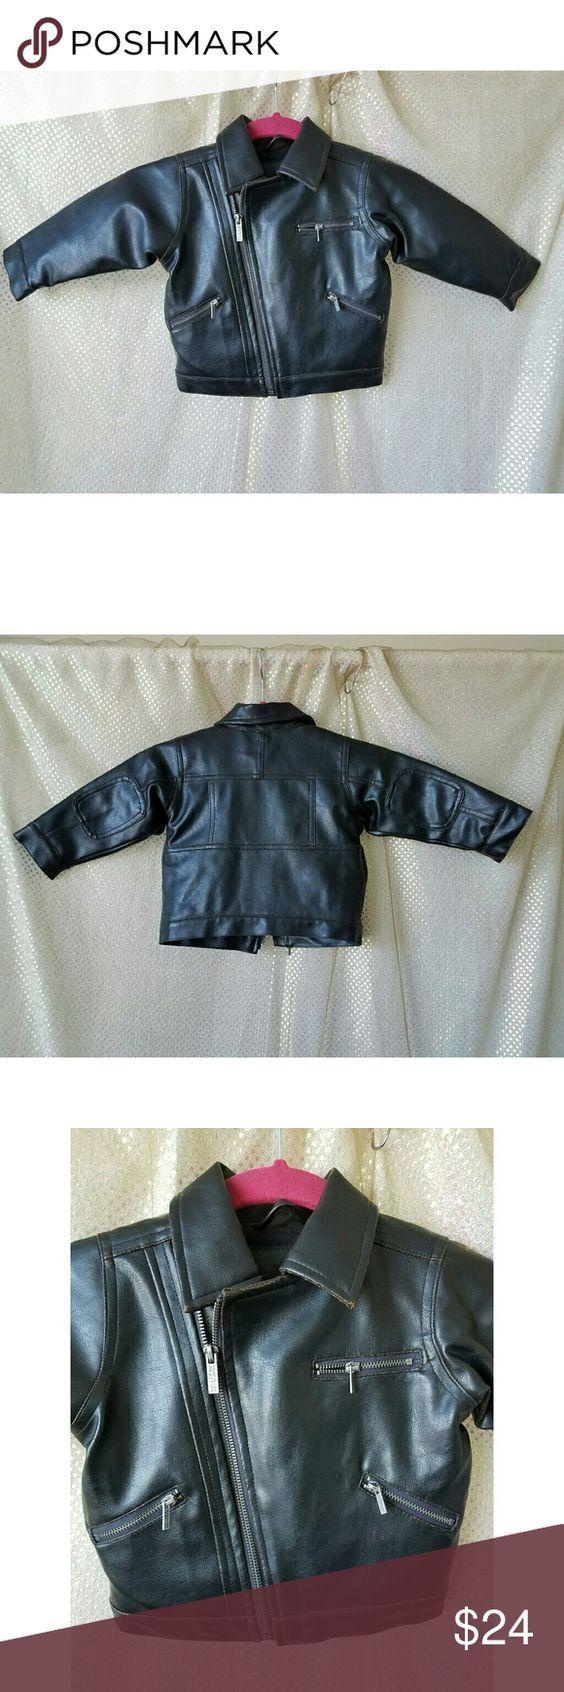 Leather jacket size 18 - Boys Leather Jacket Kenneth Cole Reaction Size 18m Kenneth Cole Reaction Baby Boys Dark Brown Faux